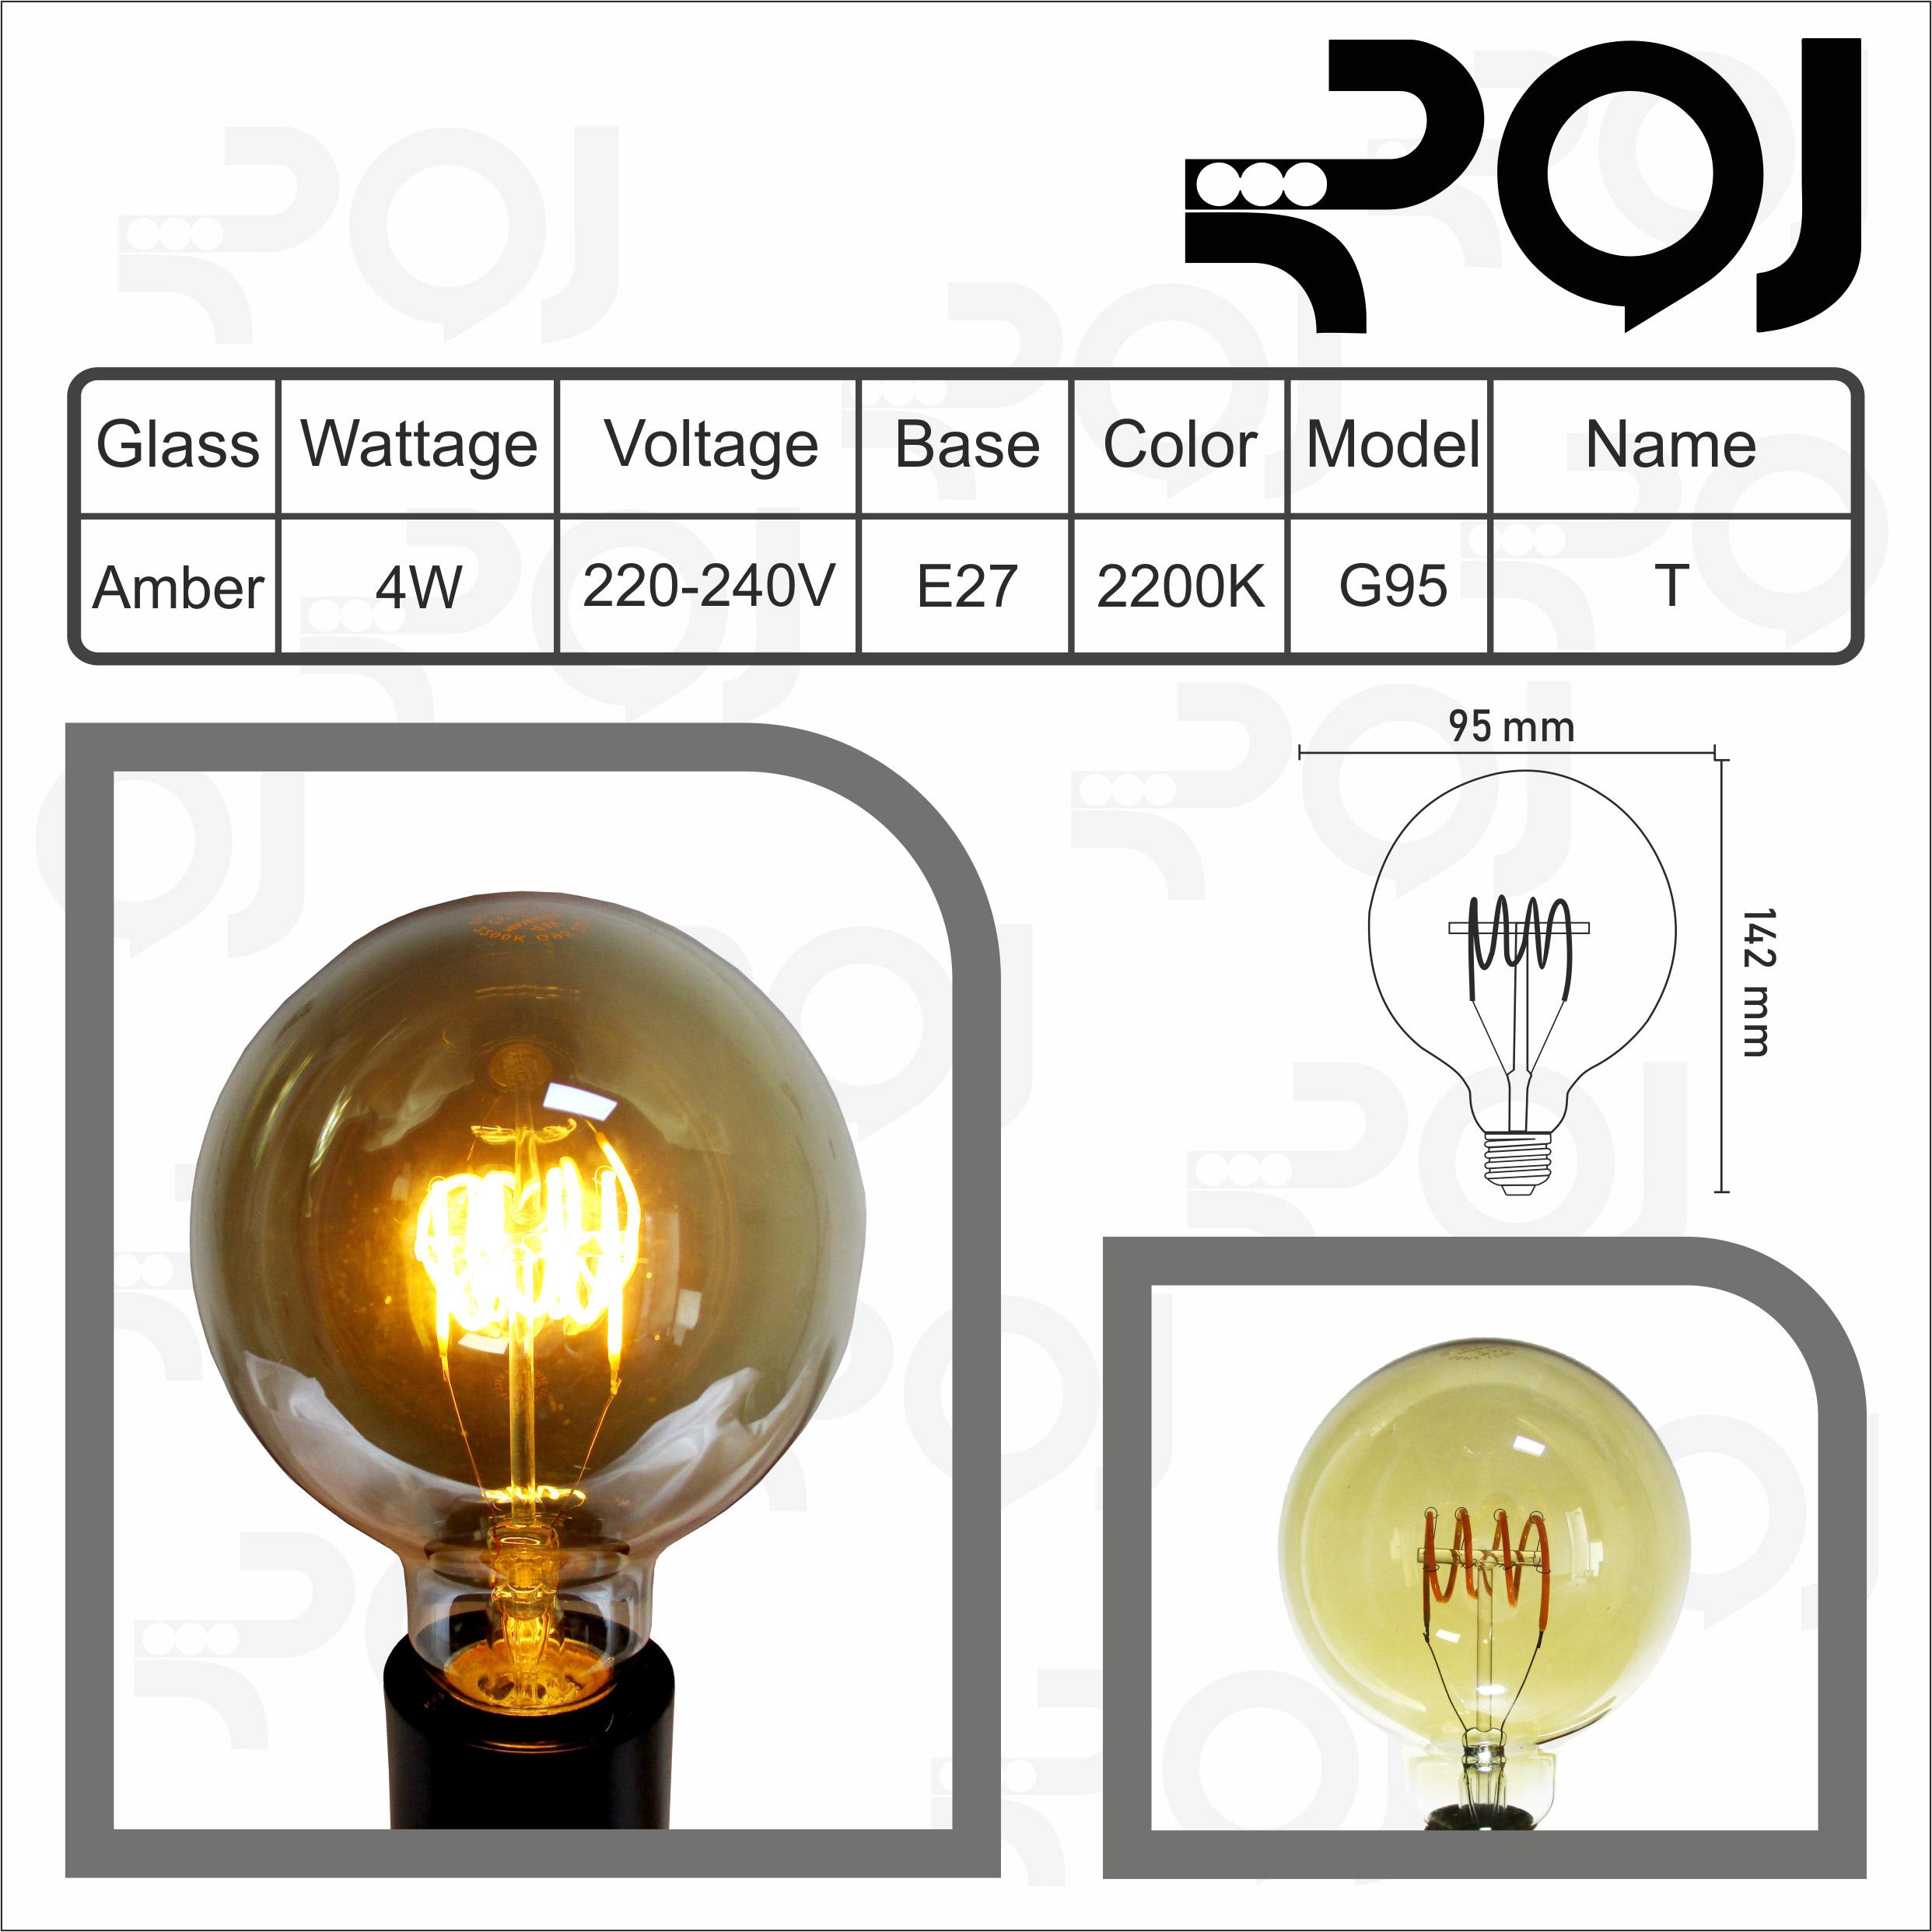 لامپ G95 طرح T فیلامنت 4 وات